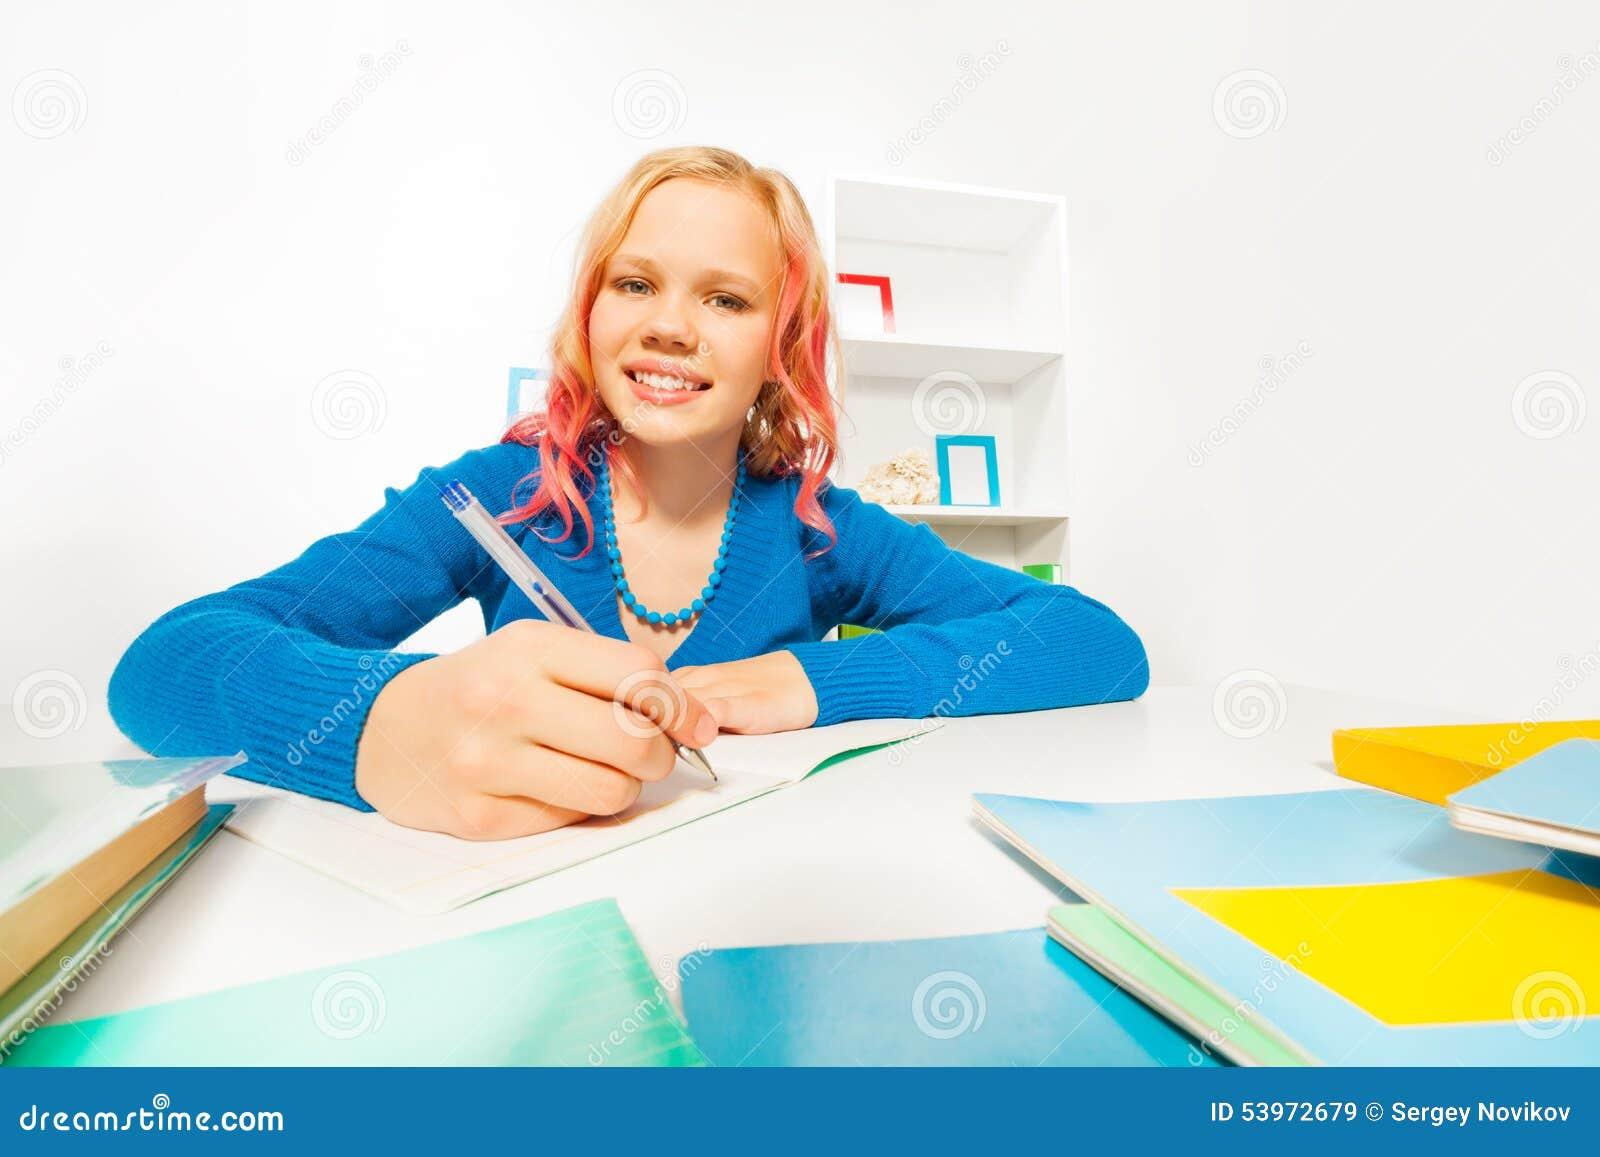 Do homework at school